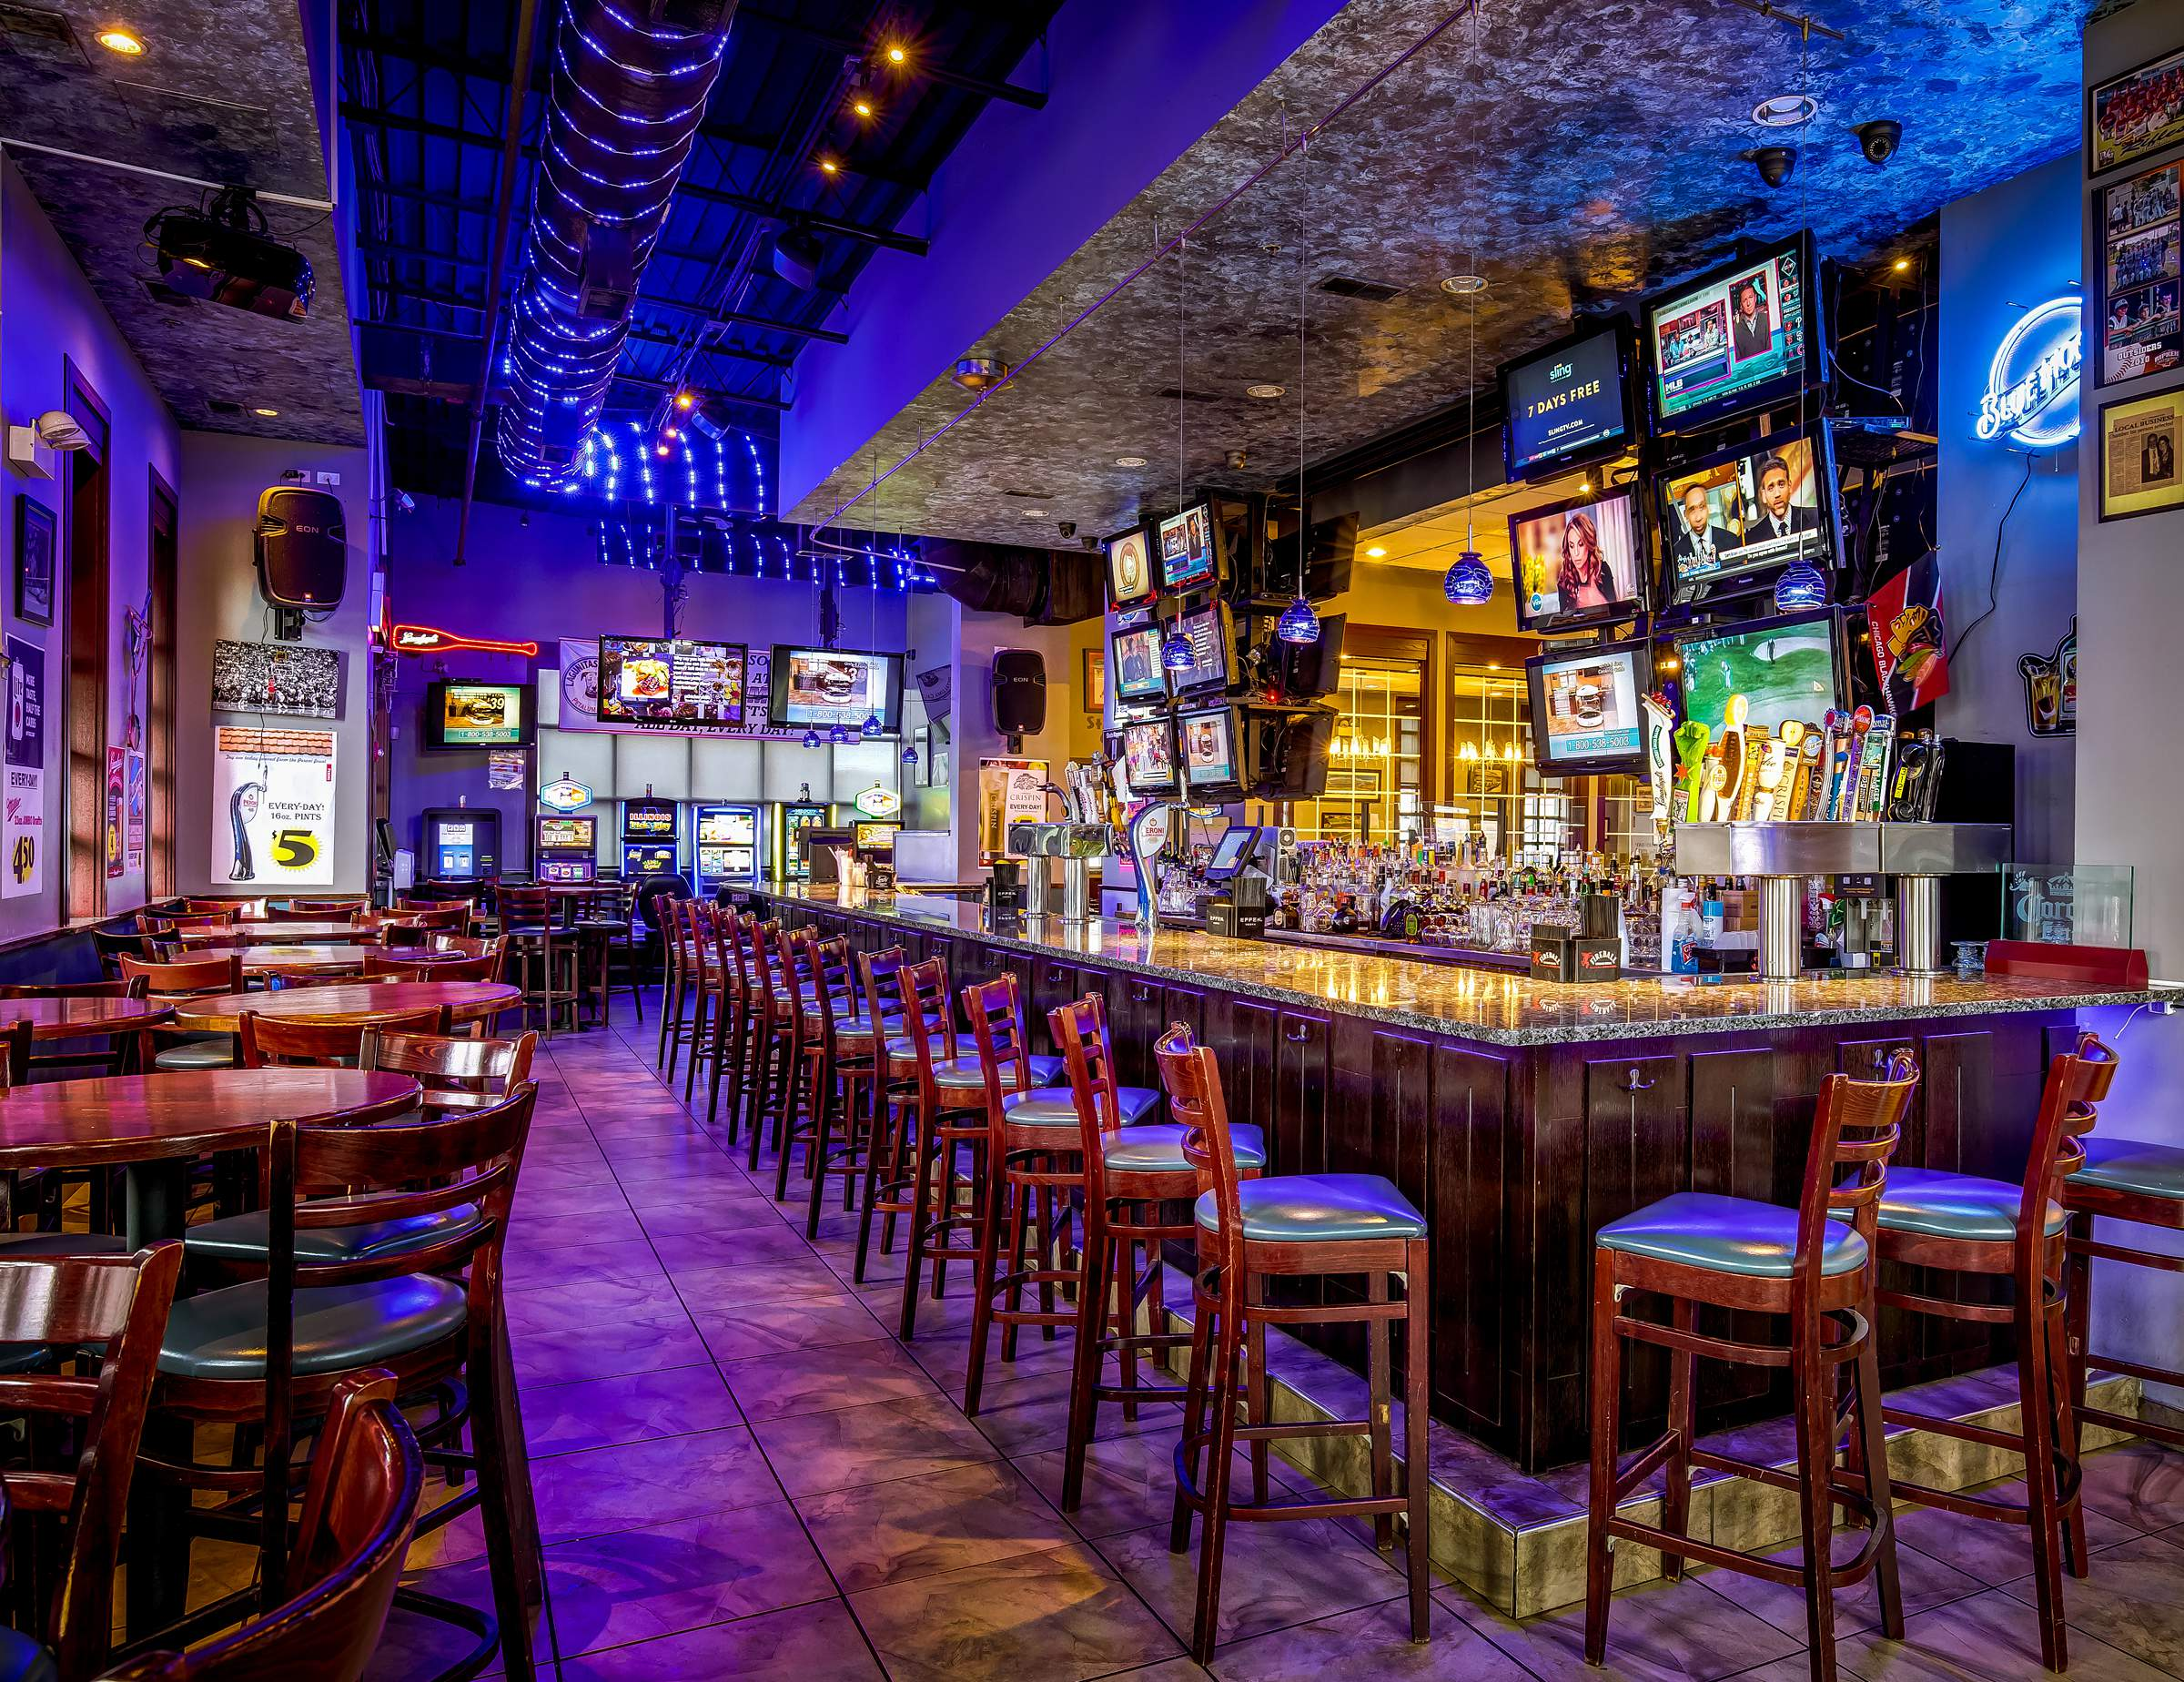 Boutiques In Chicago >> Prime Time Restaurant Google Virtual Tour Chicago | WalkThru360 - Google 360 Chicago, Nationwide